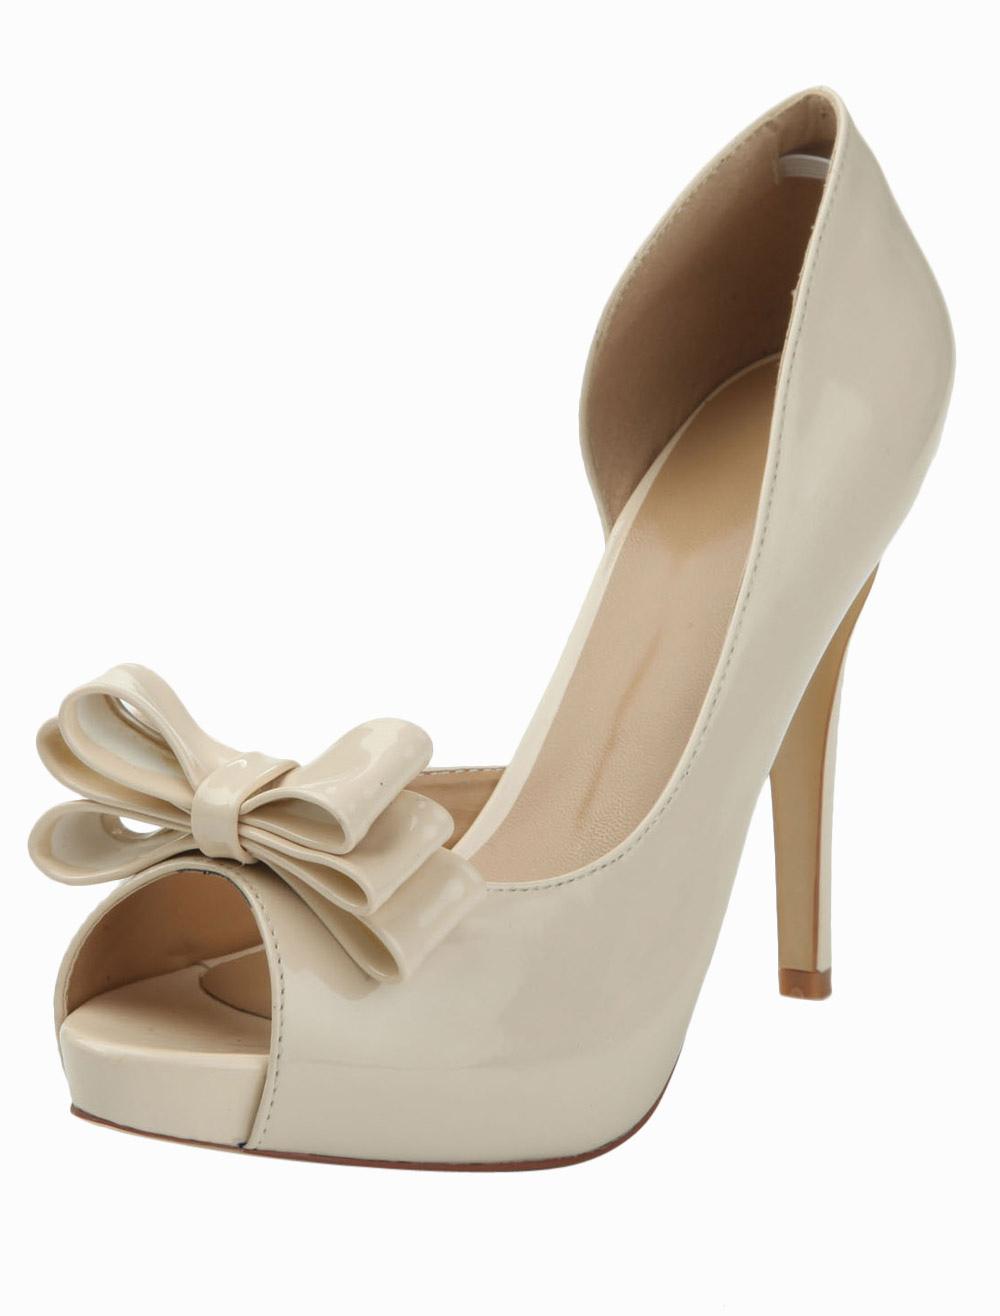 Gorgeous Nude Stiletto Heel Bow Patent PU Upper Peep Toe High Heels